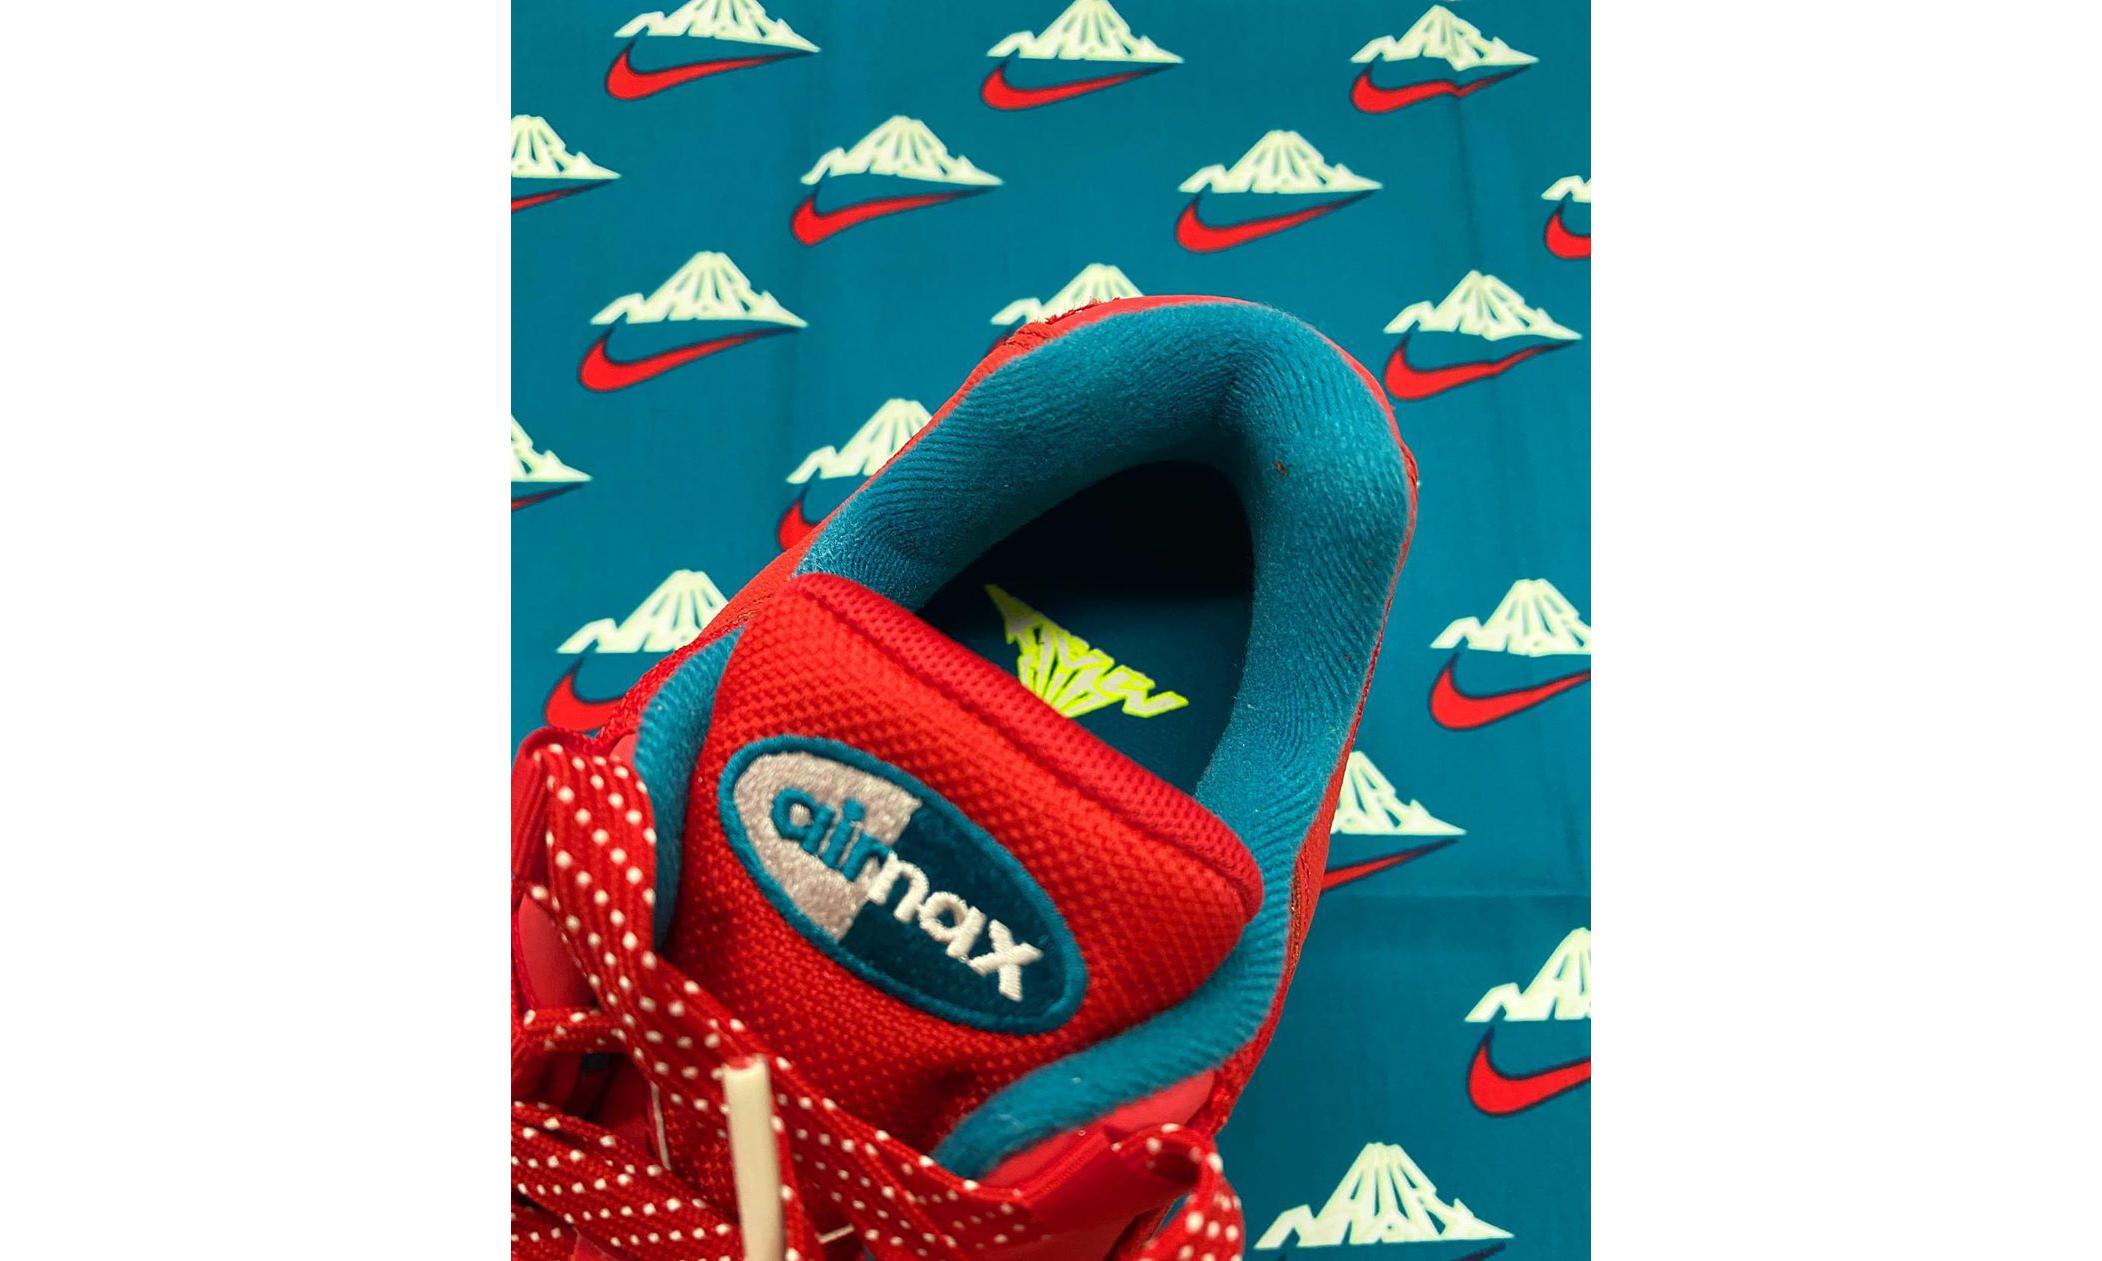 atmos 与 Nike 打造富士山主题 Air Max 95